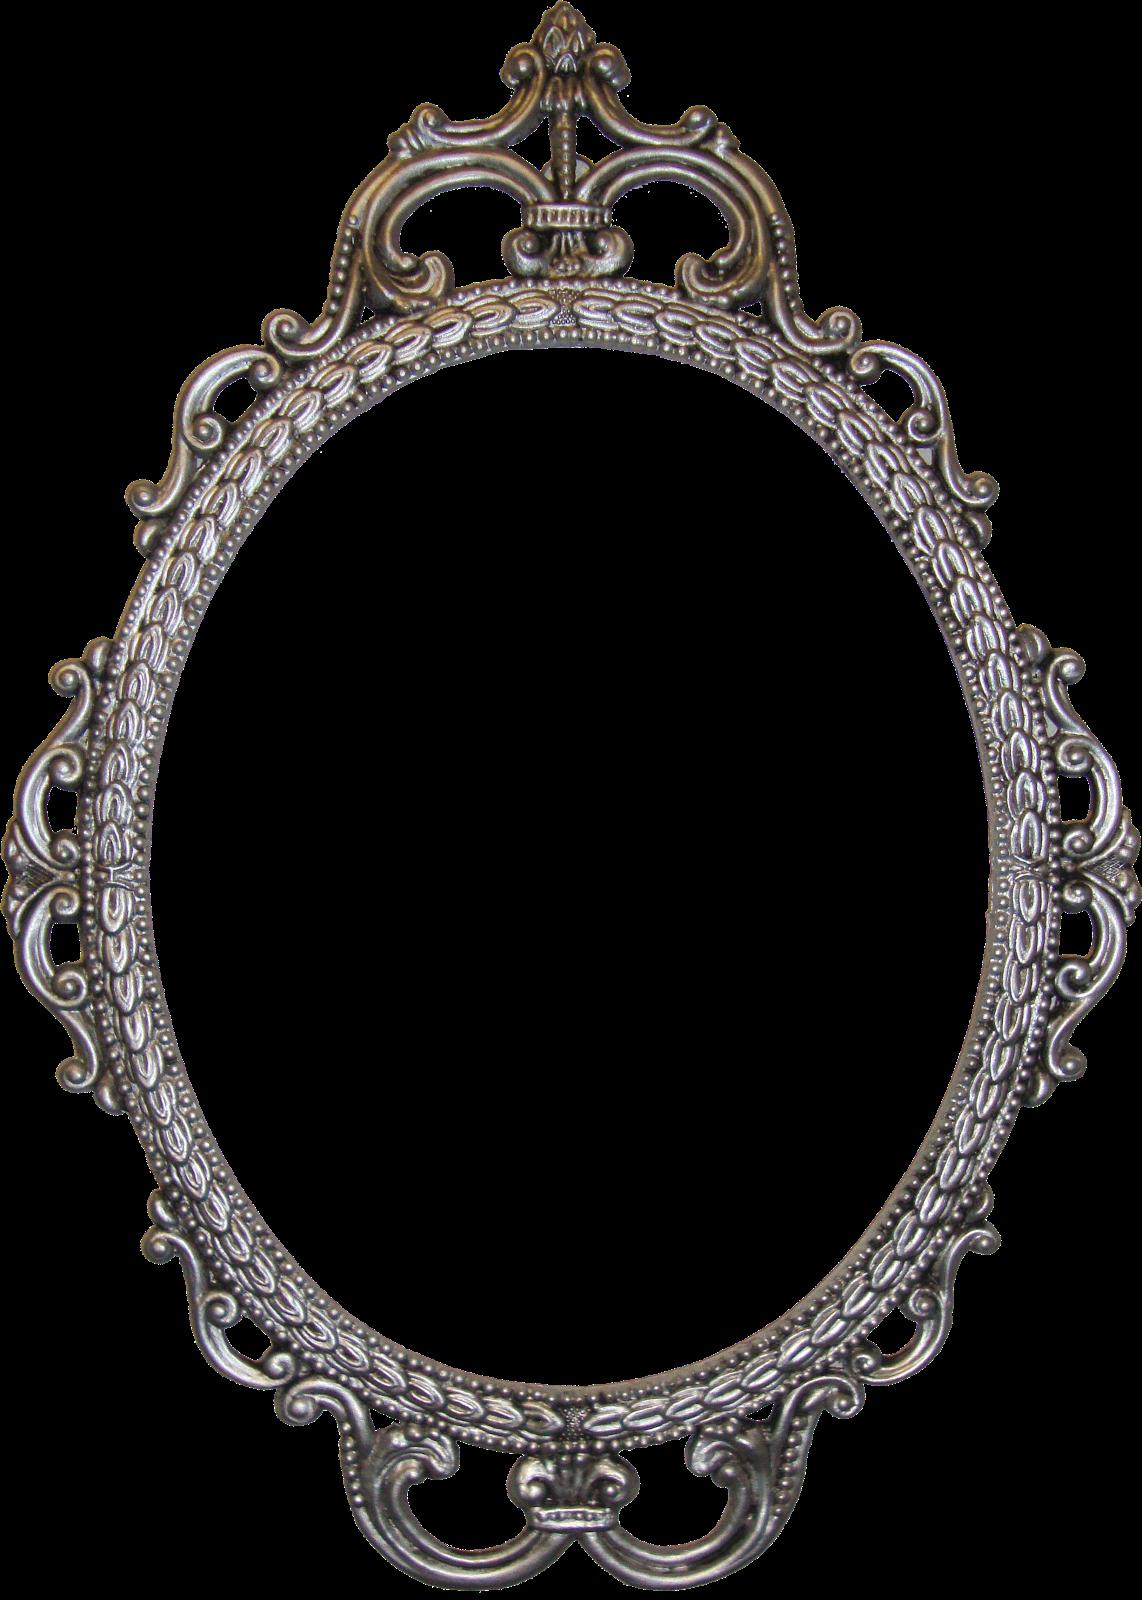 Freebie 4: Fancy Vintage Ornate Digital Frames! | Pinterest ...